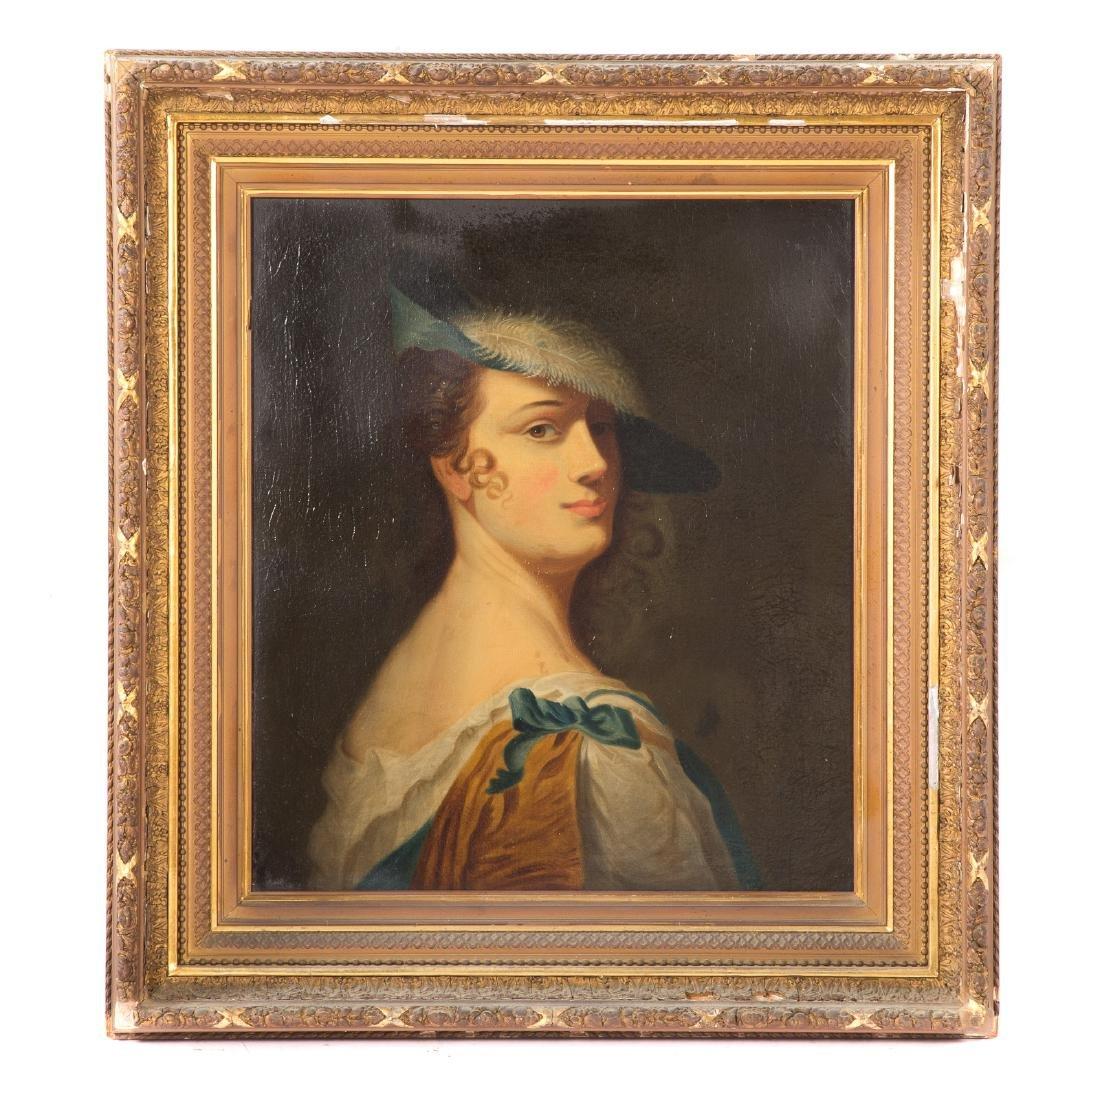 British School, c. 1800. Portrait of a Lady, oil